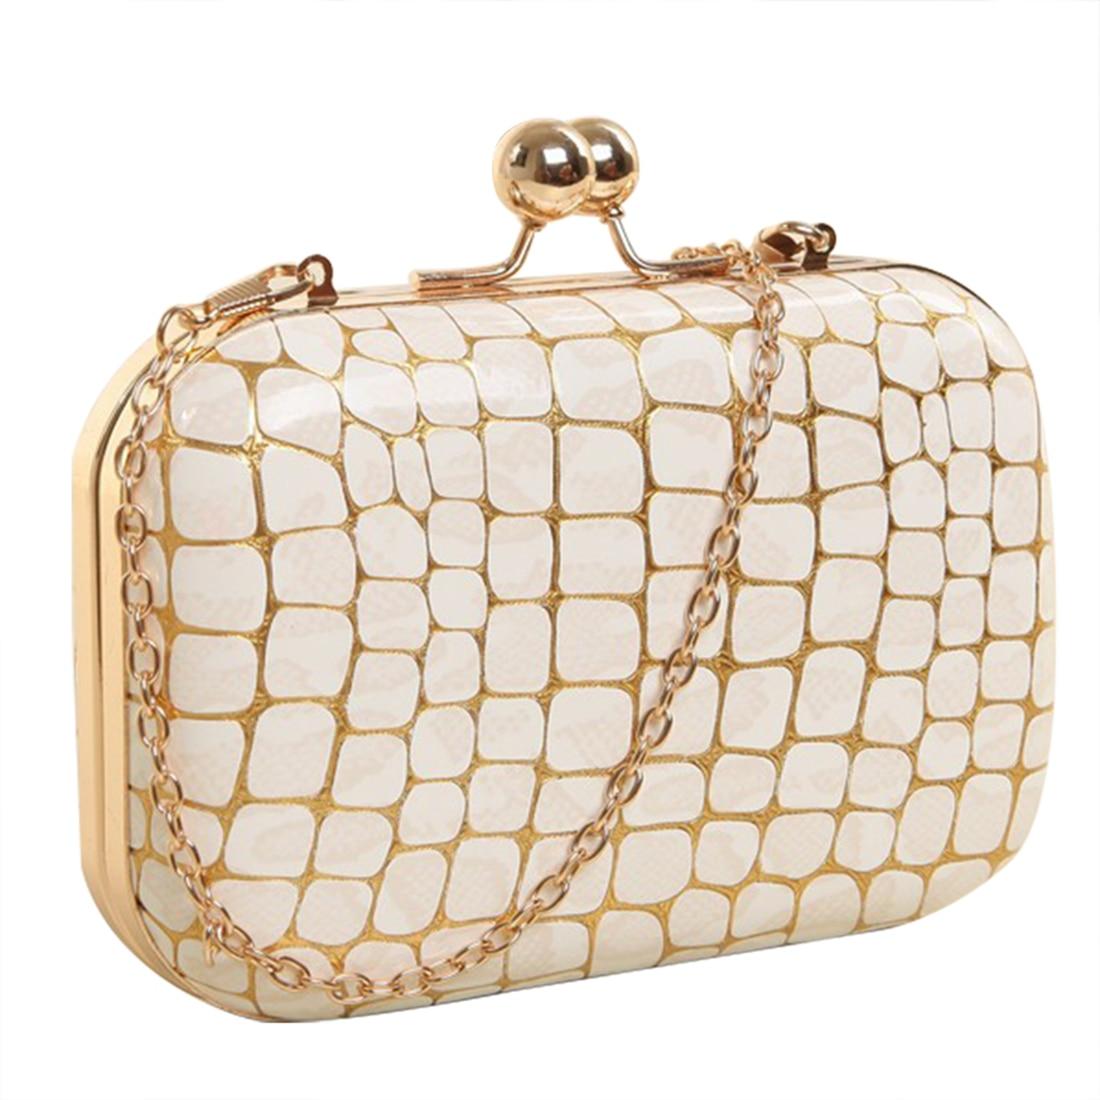 Hot Fashion Retro Stone pattern PU leather Womens mini evening bag fashion clutch banquet bag girls shoulder bag Messenger ba